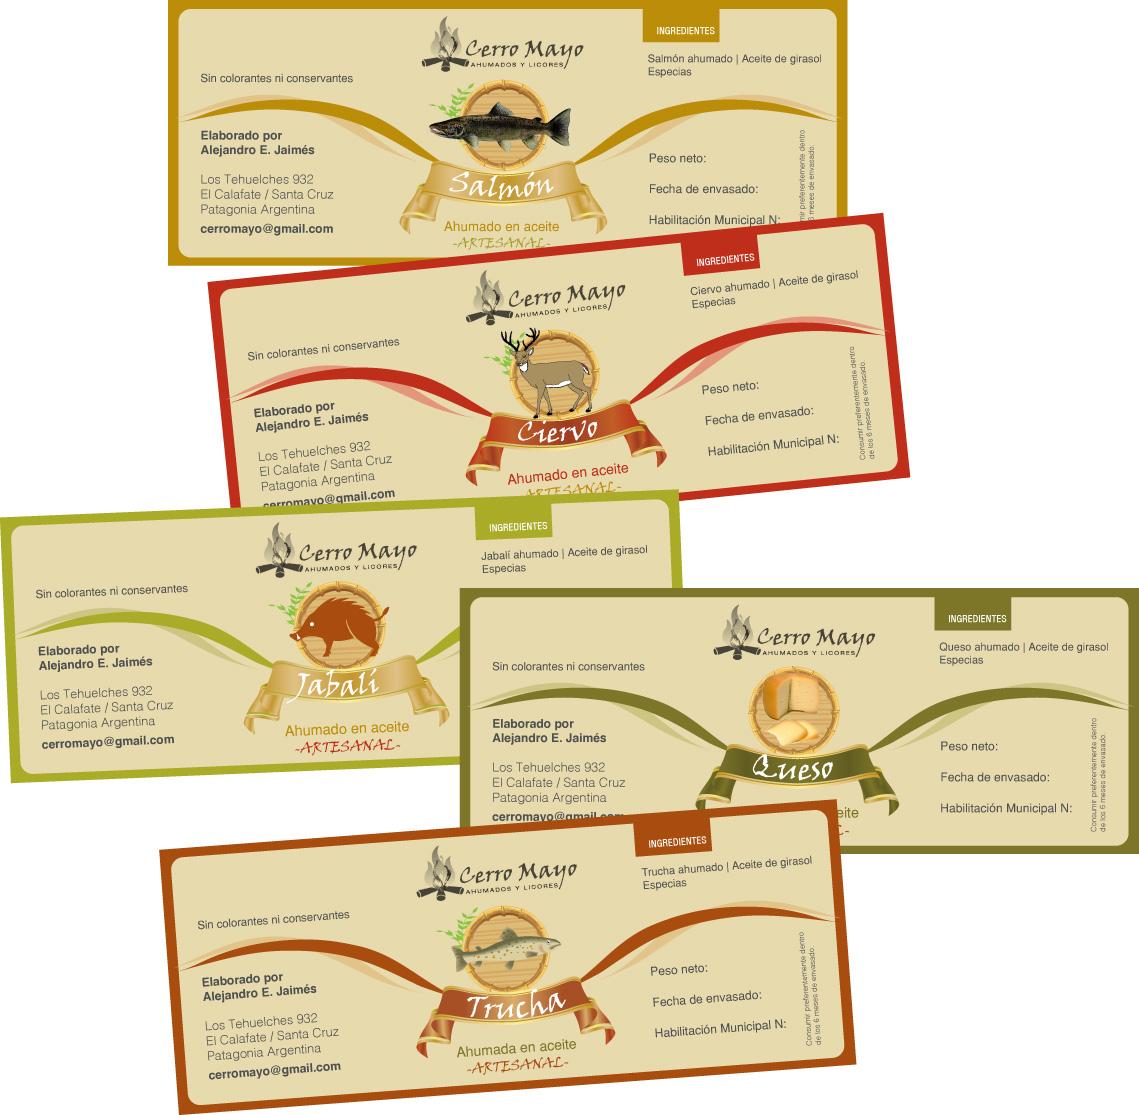 C r i p t i c o marzo 2010 for Diseno de etiquetas